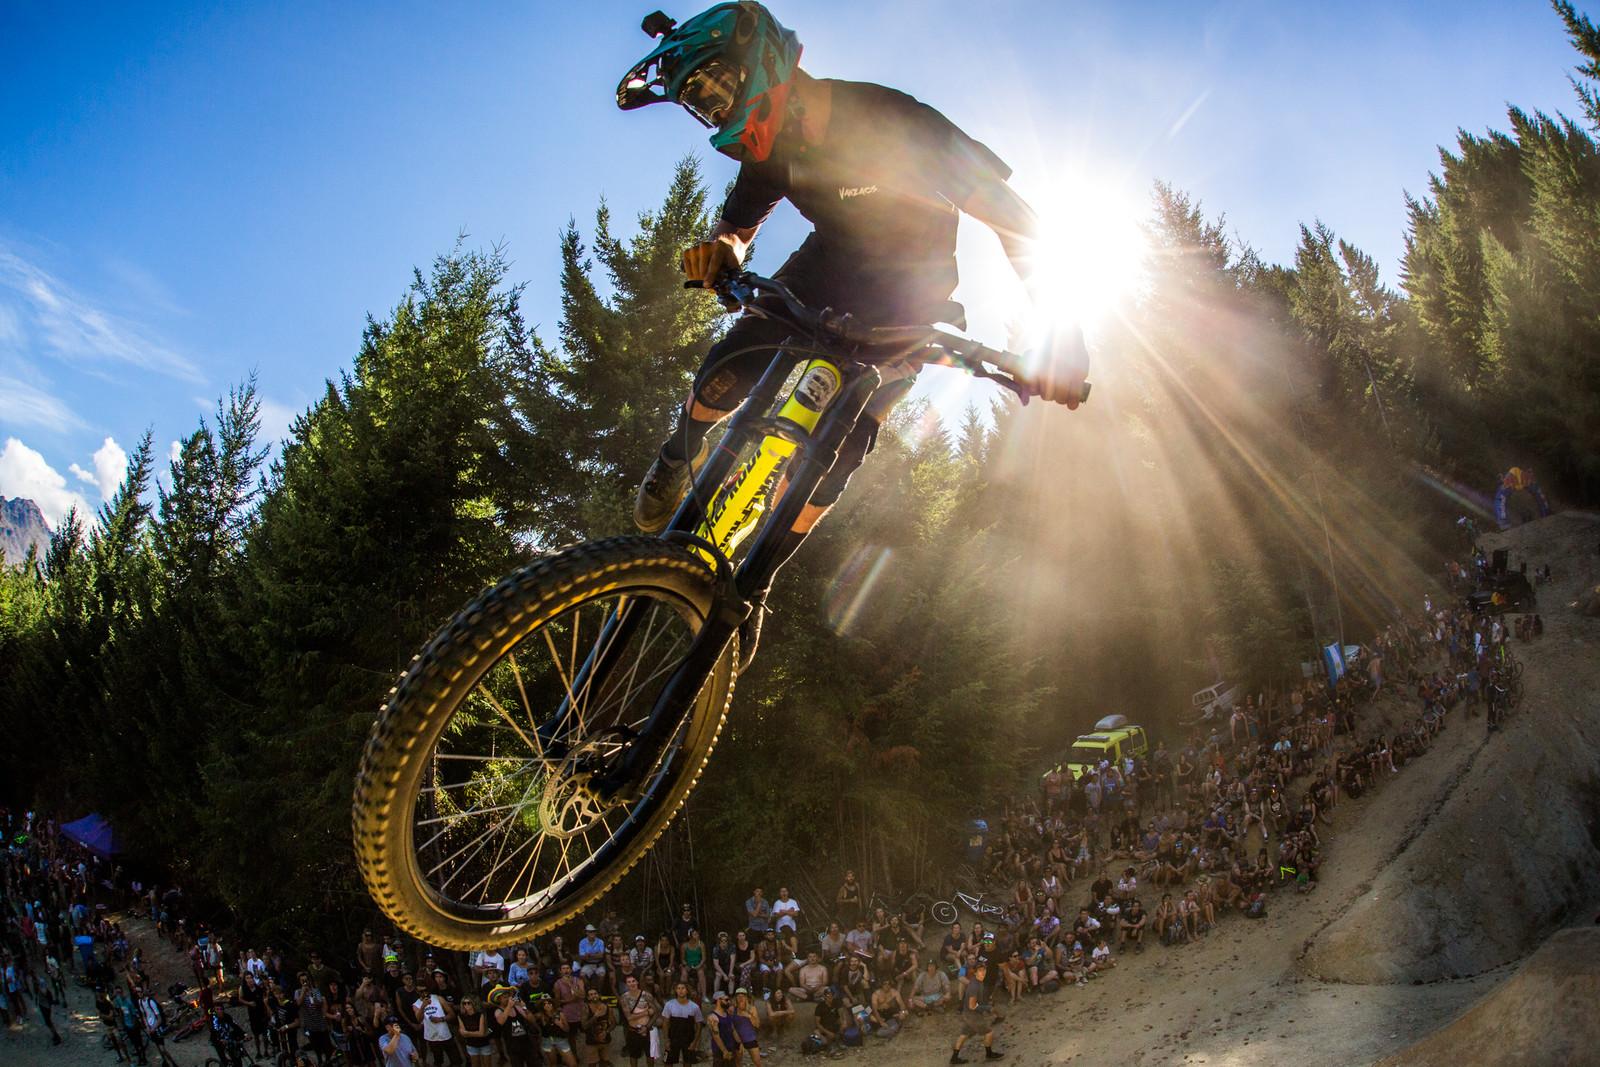 Jackson Davis - McGazza Fest Dream Track Jam - Mountain Biking Pictures - Vital MTB